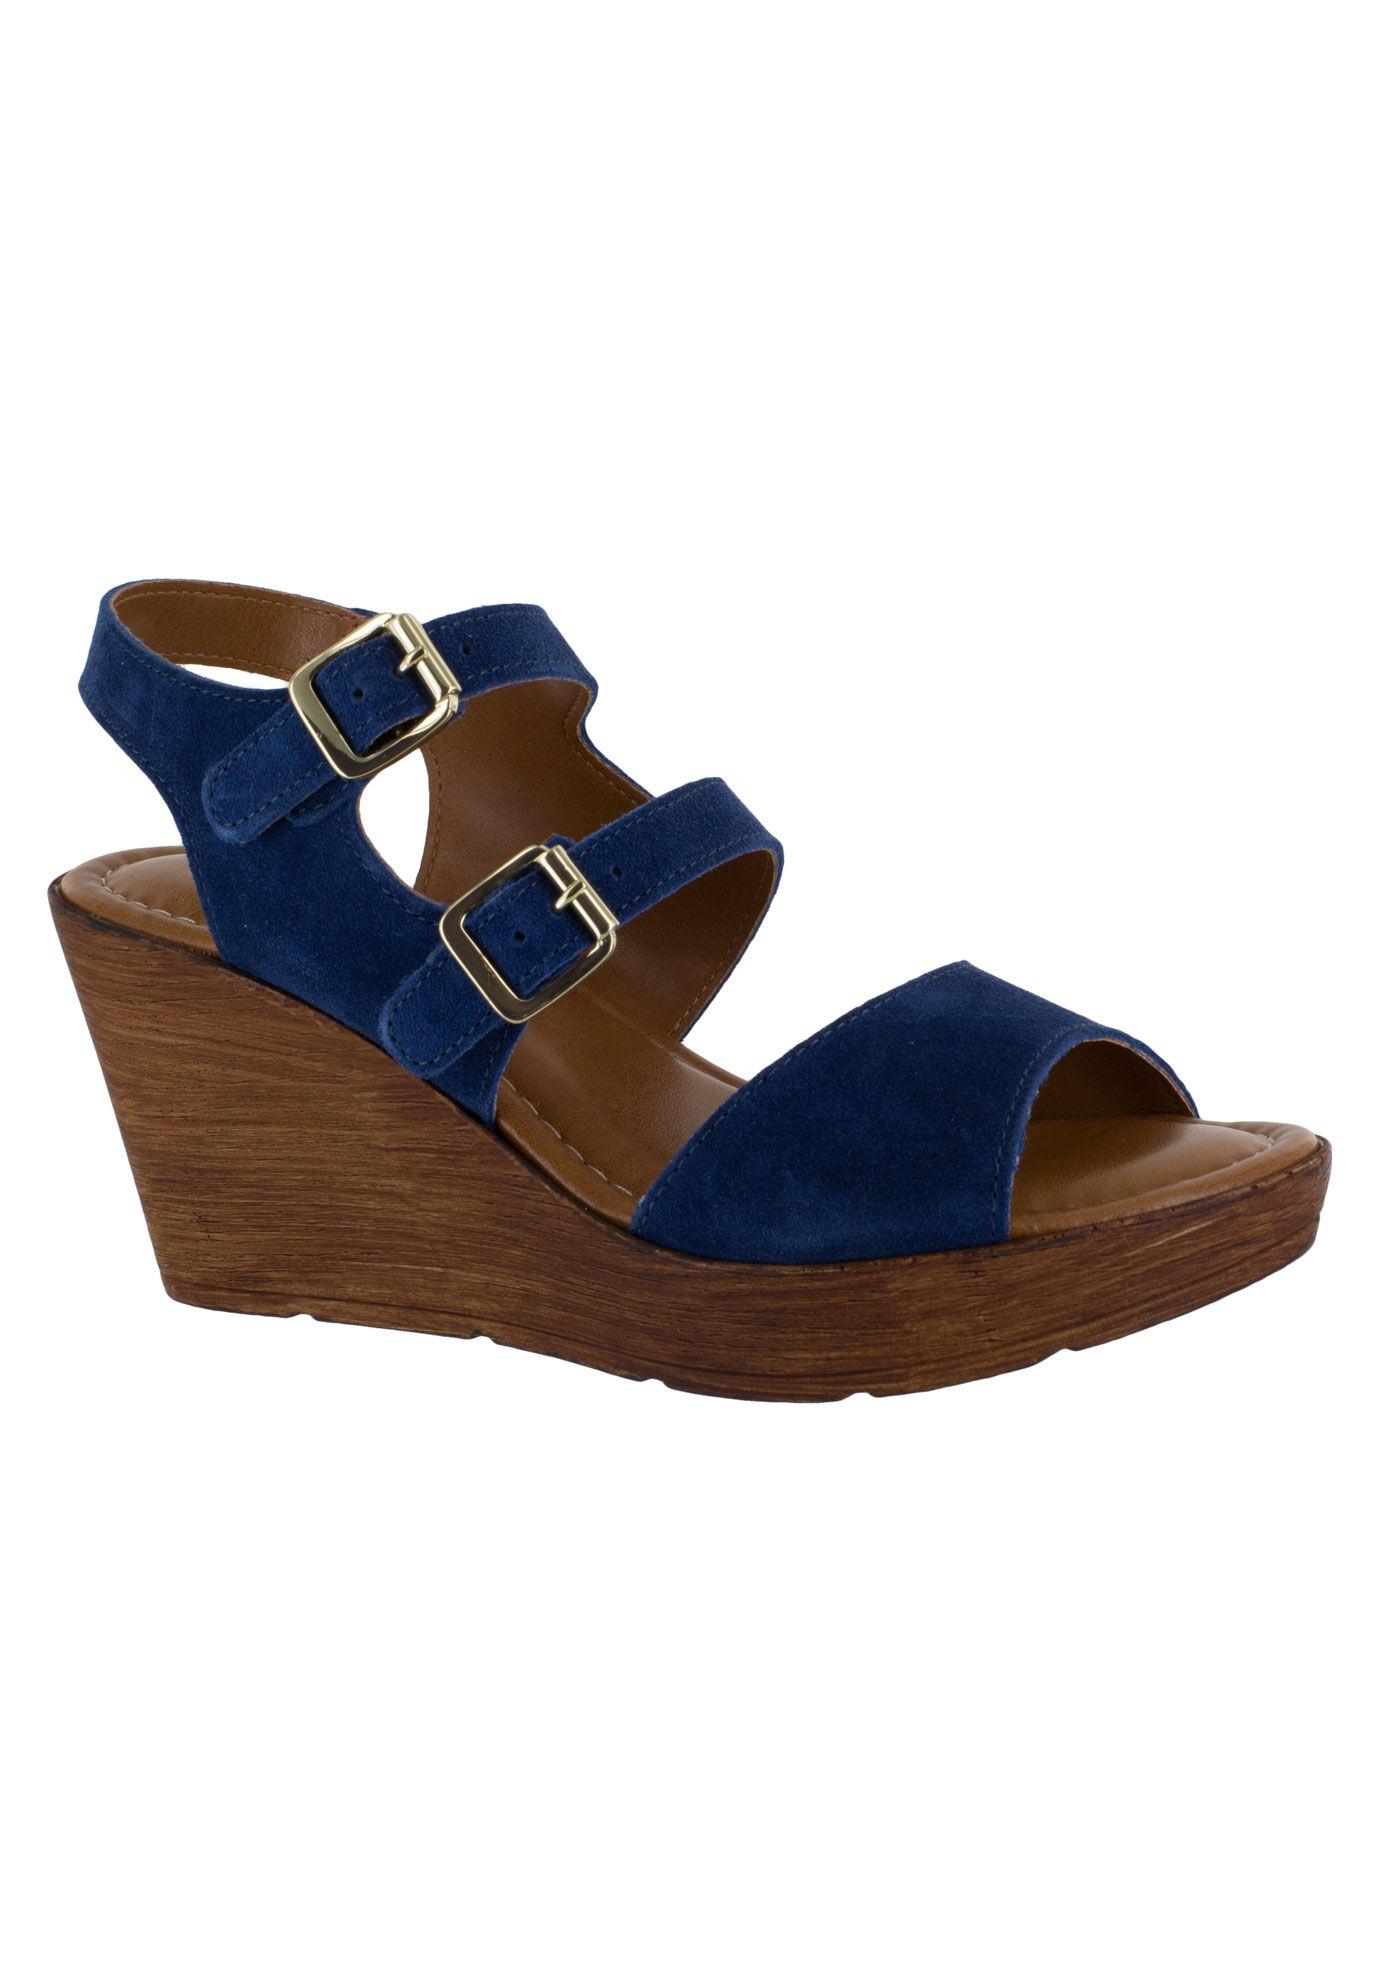 Ani-Italy Sandals by Bella Vita®